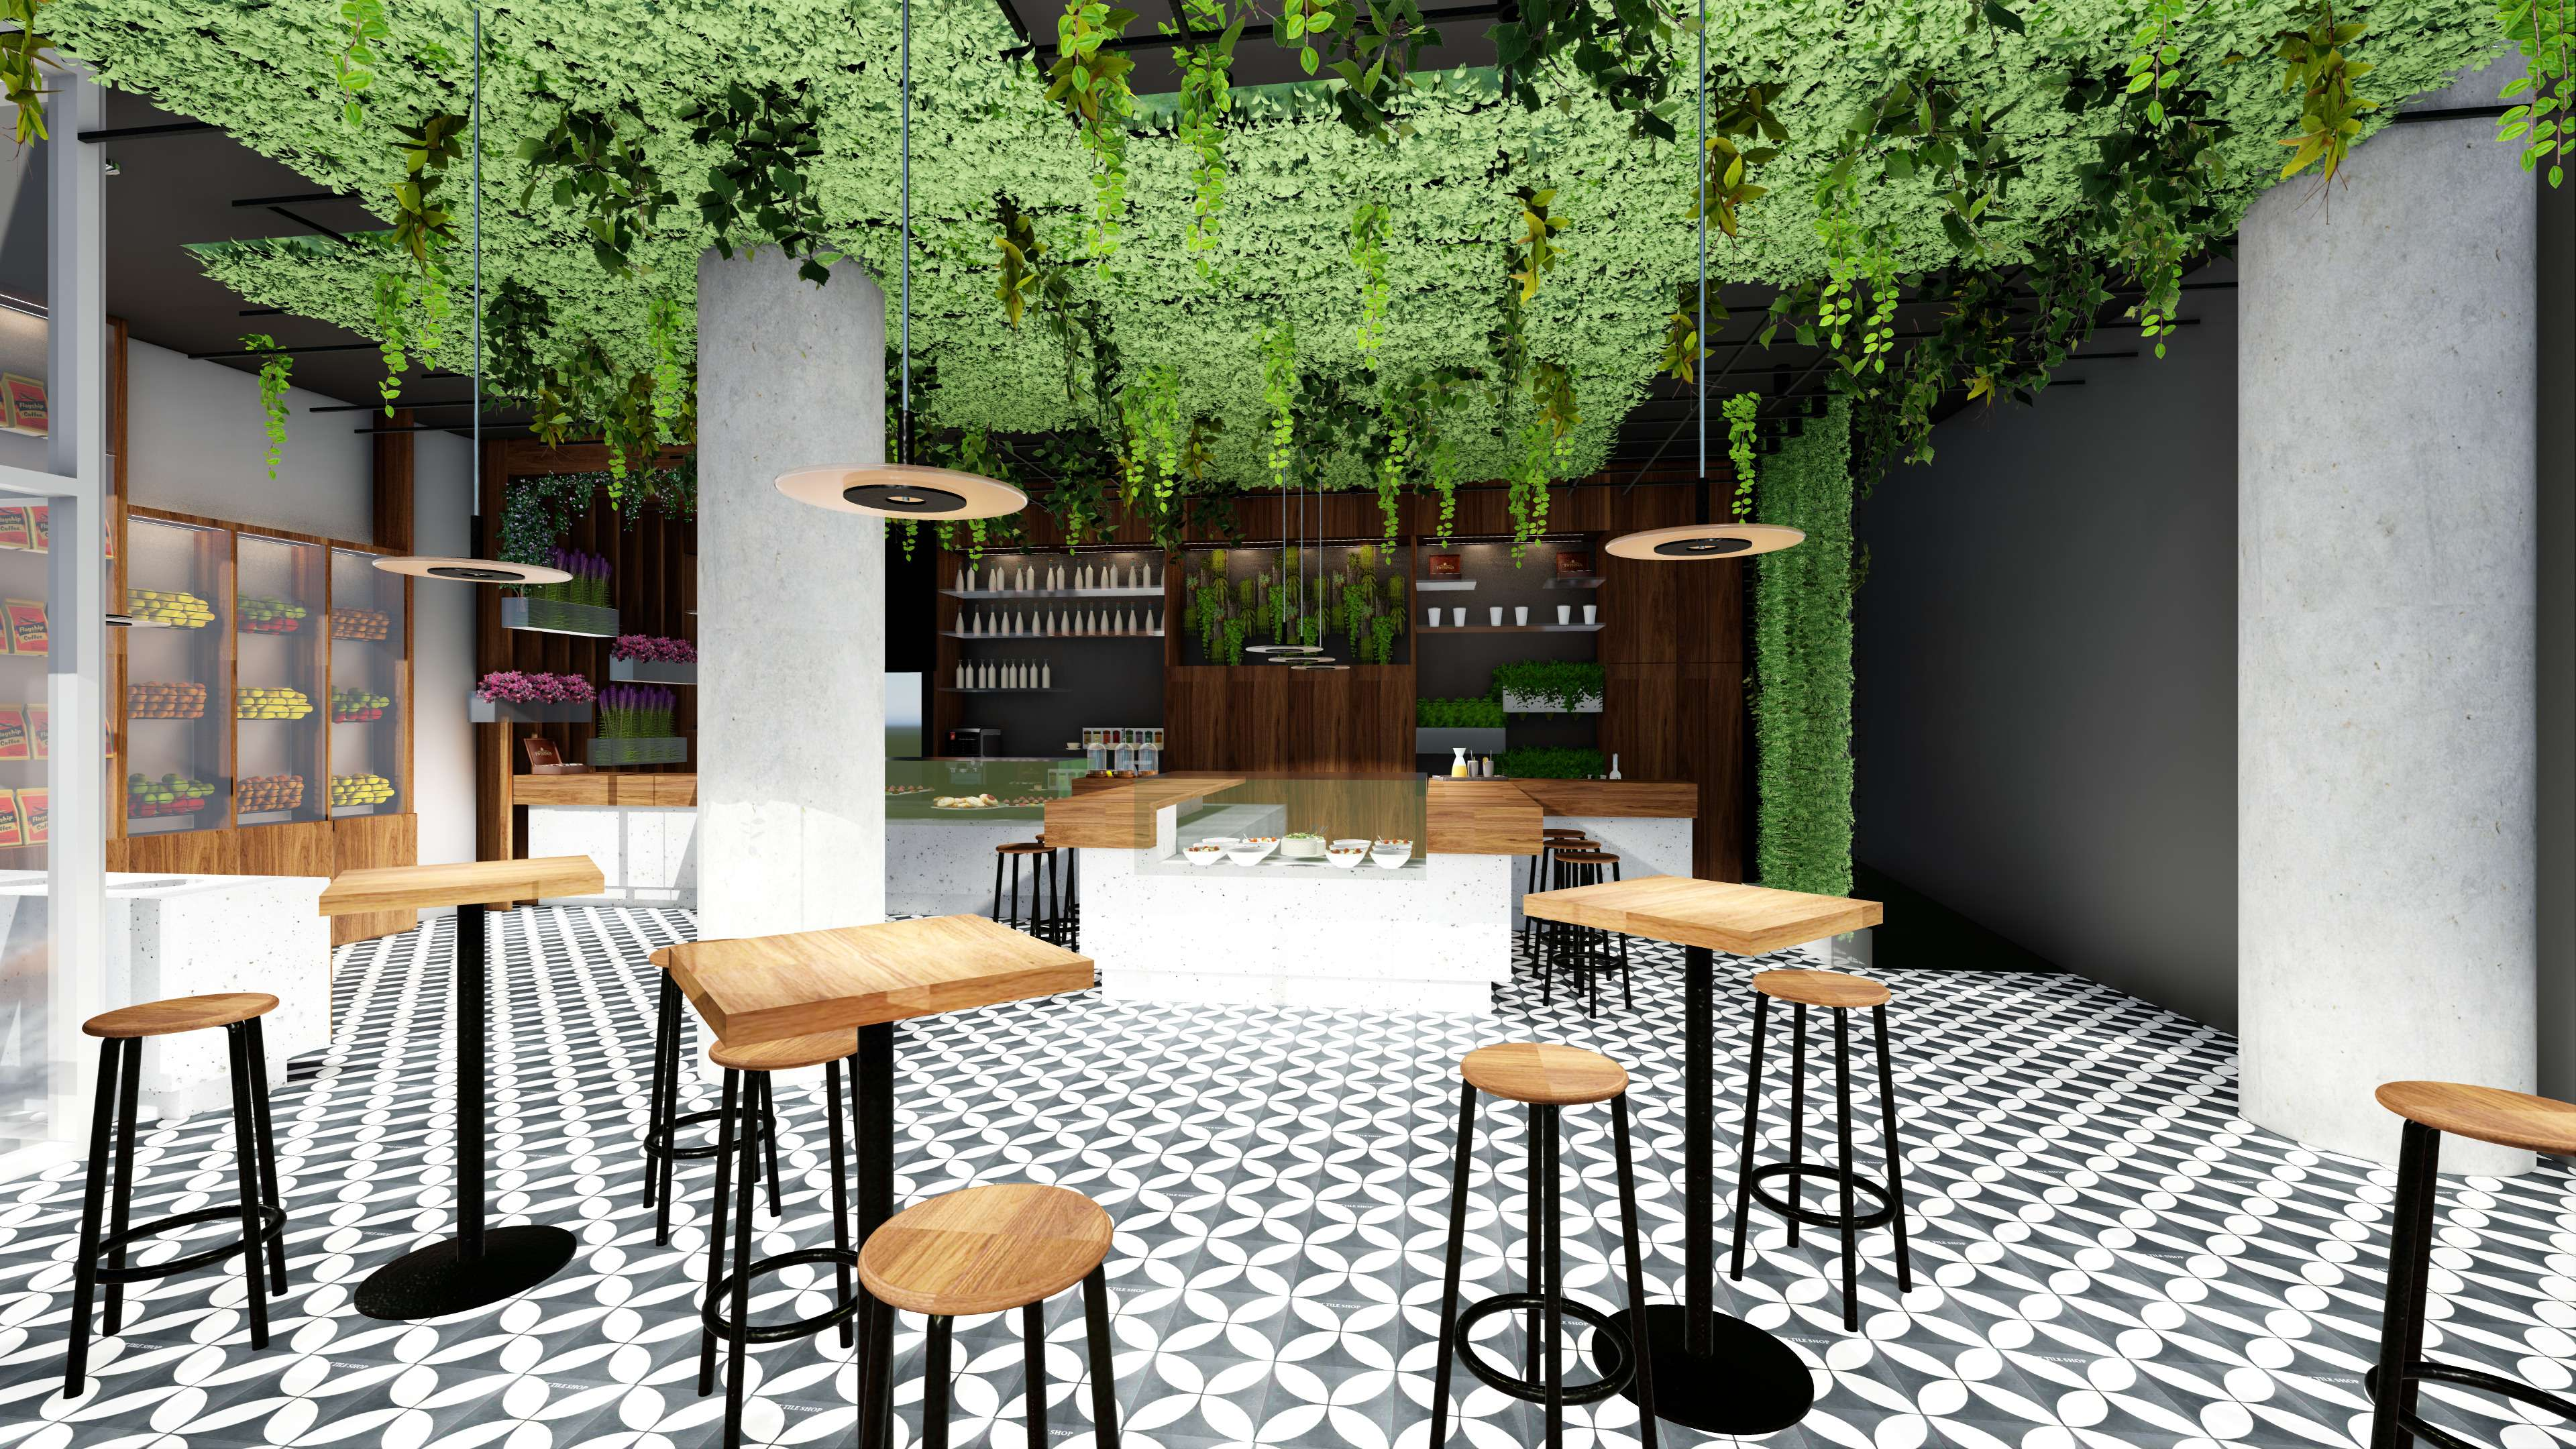 Cafenea_Dalia-Randare--7